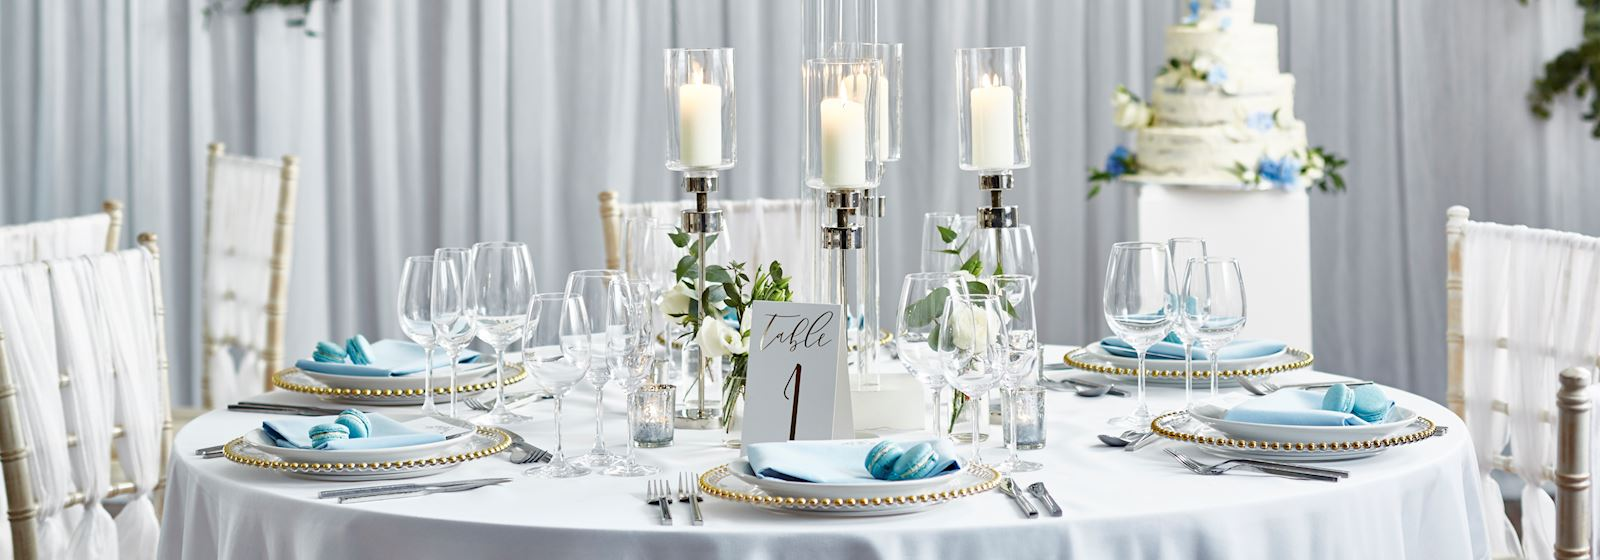 Breadsall Priory Marriott Hotel & Country Club Weddings